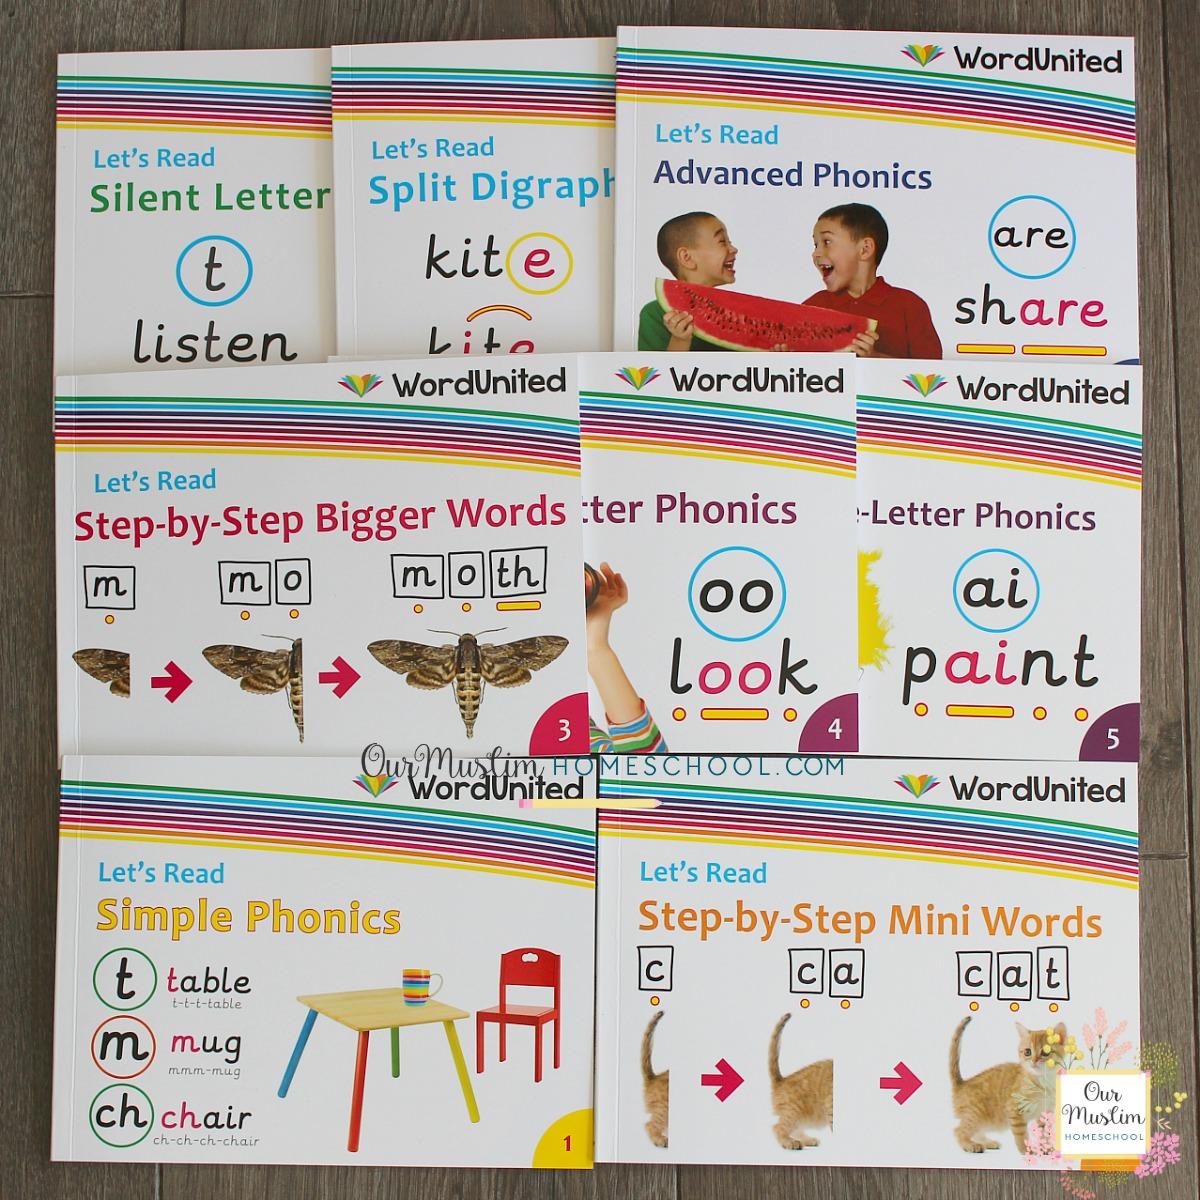 Phonics books by WordUnited